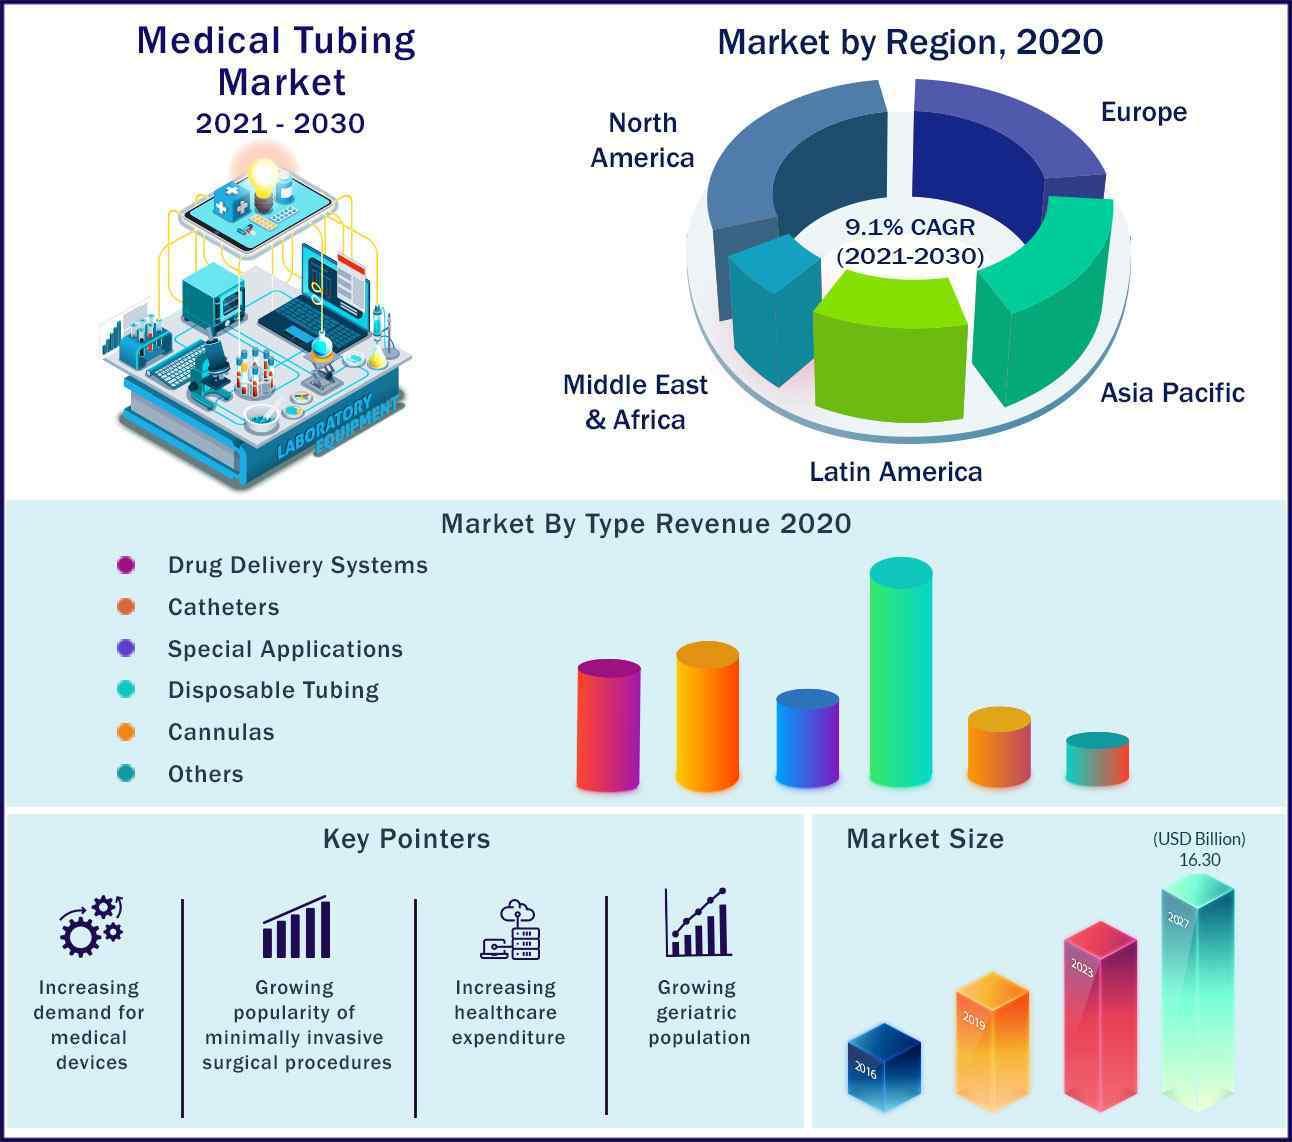 Global Medical Tubing Market 2021-2030